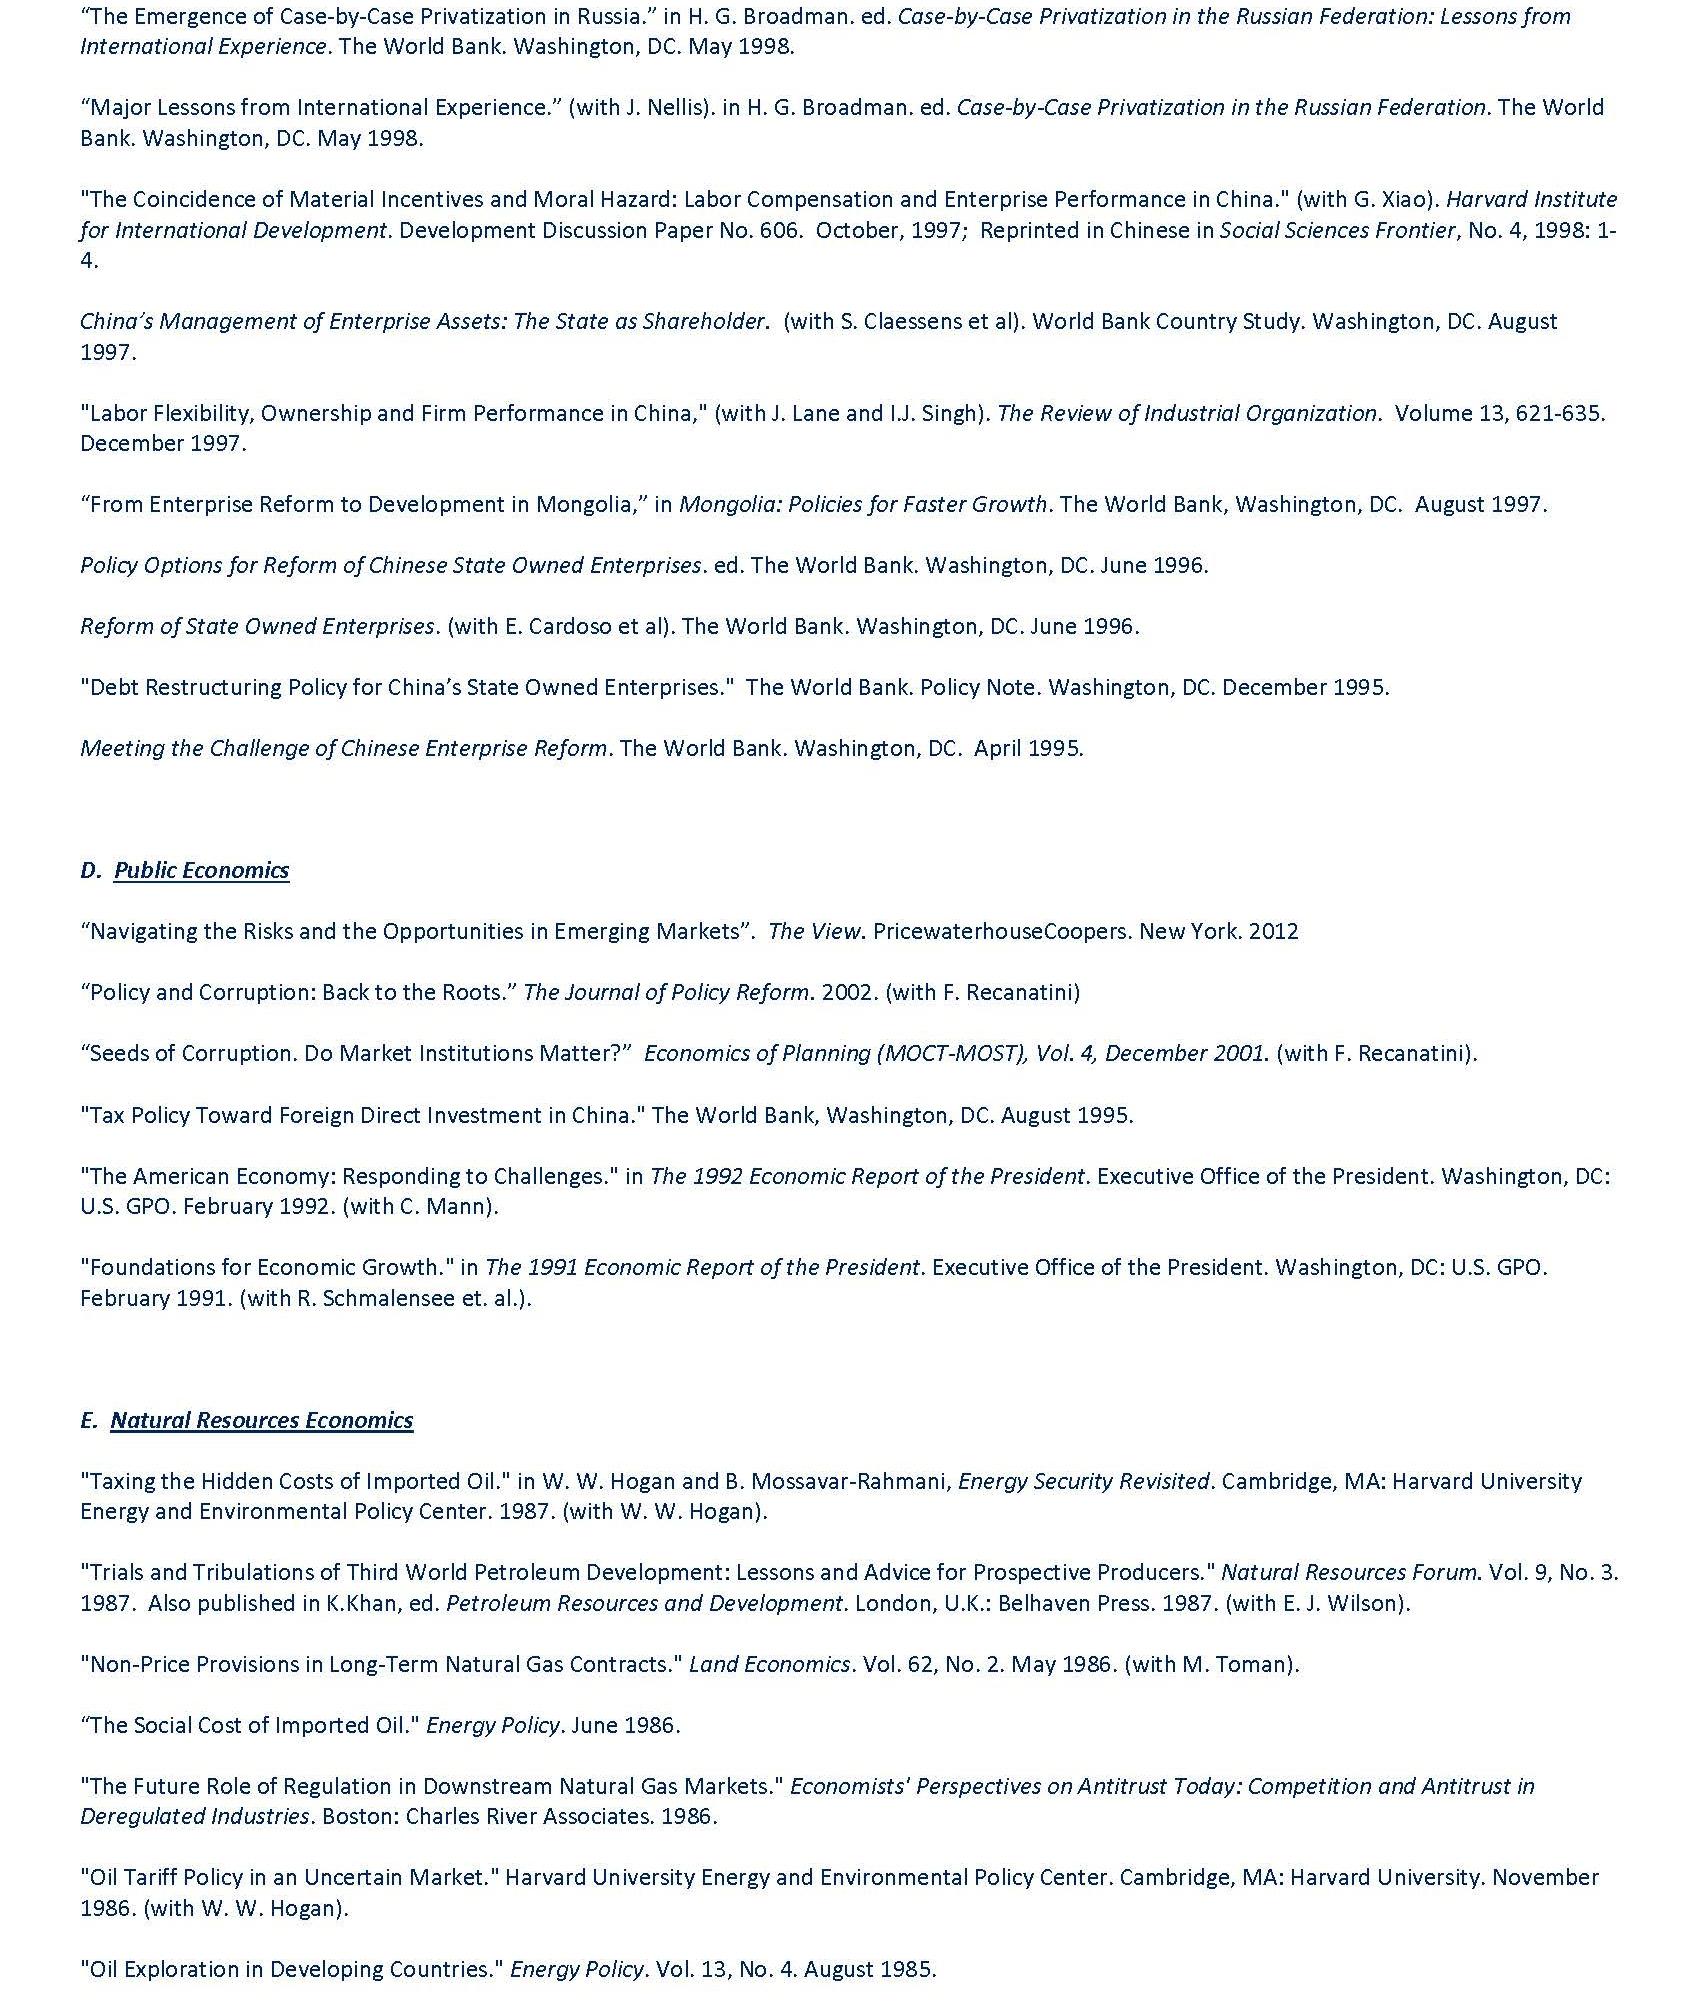 Harry Broadman Ac Full wGM 8-17-18_Page_6.jpg